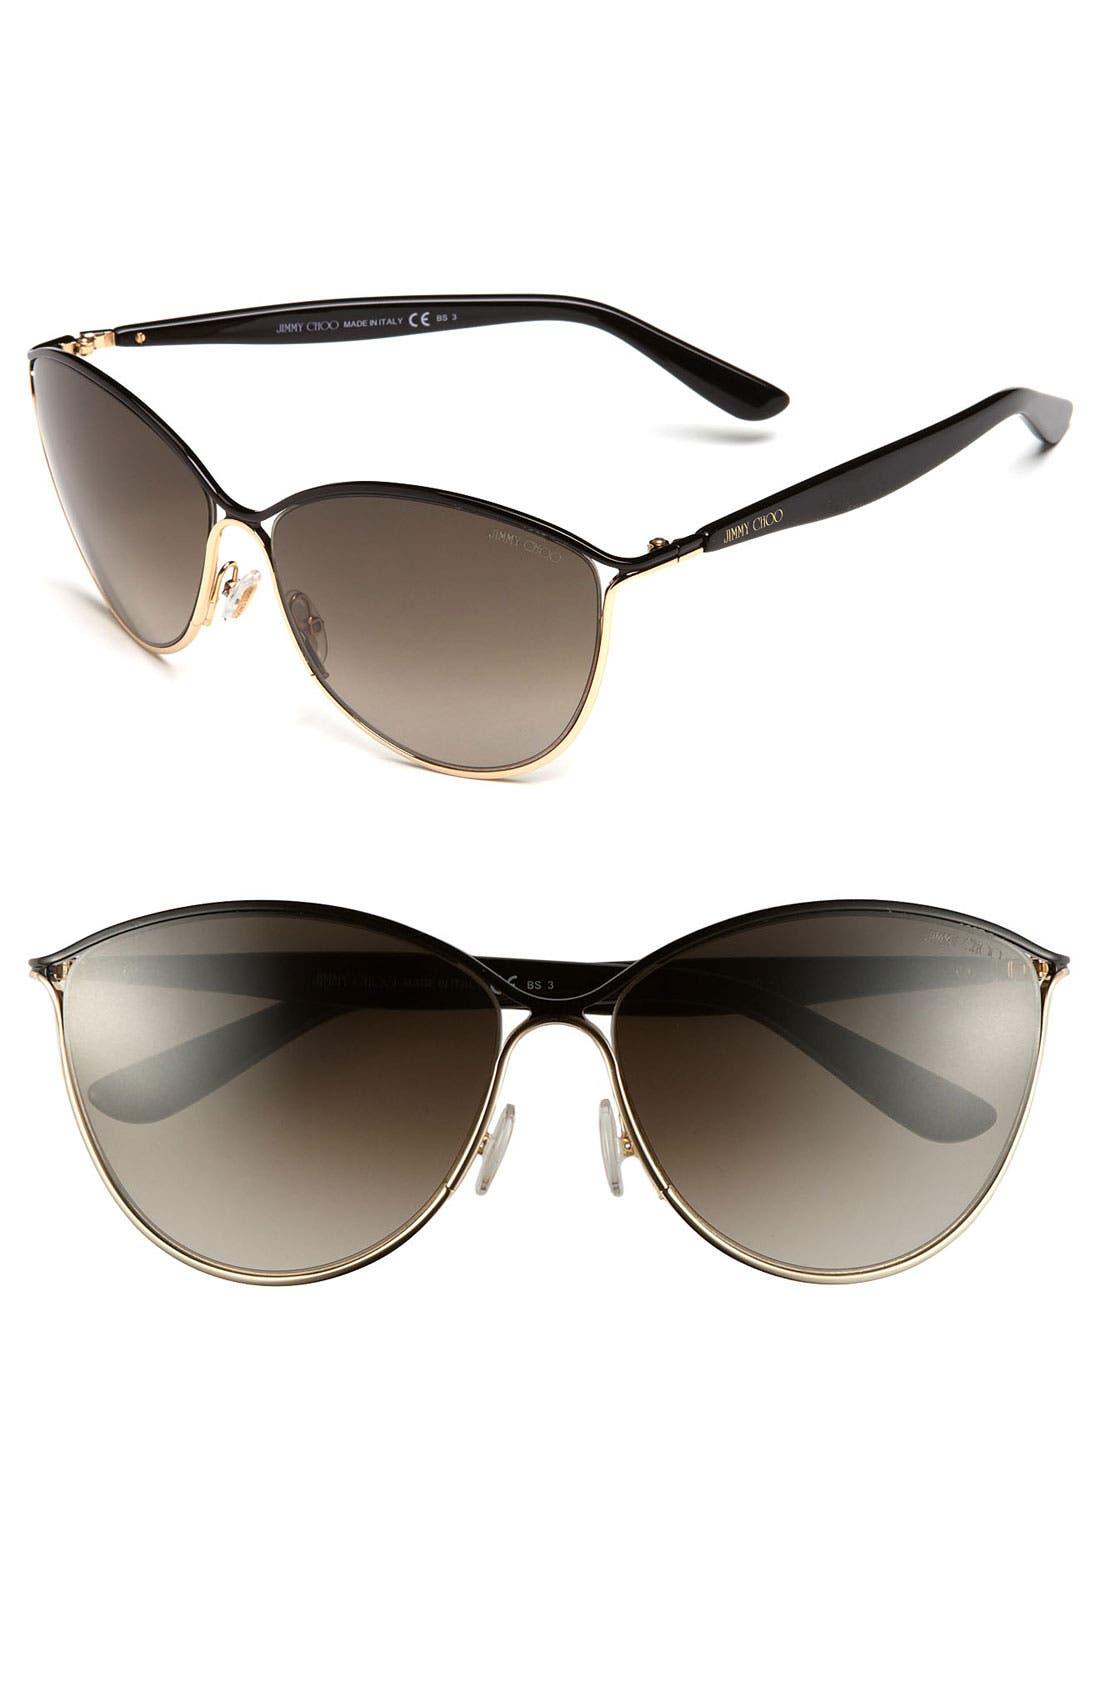 Alternate Image 1 Selected - Jimmy Choo 'Tanis' 59mm Cat's Eye Sunglasses